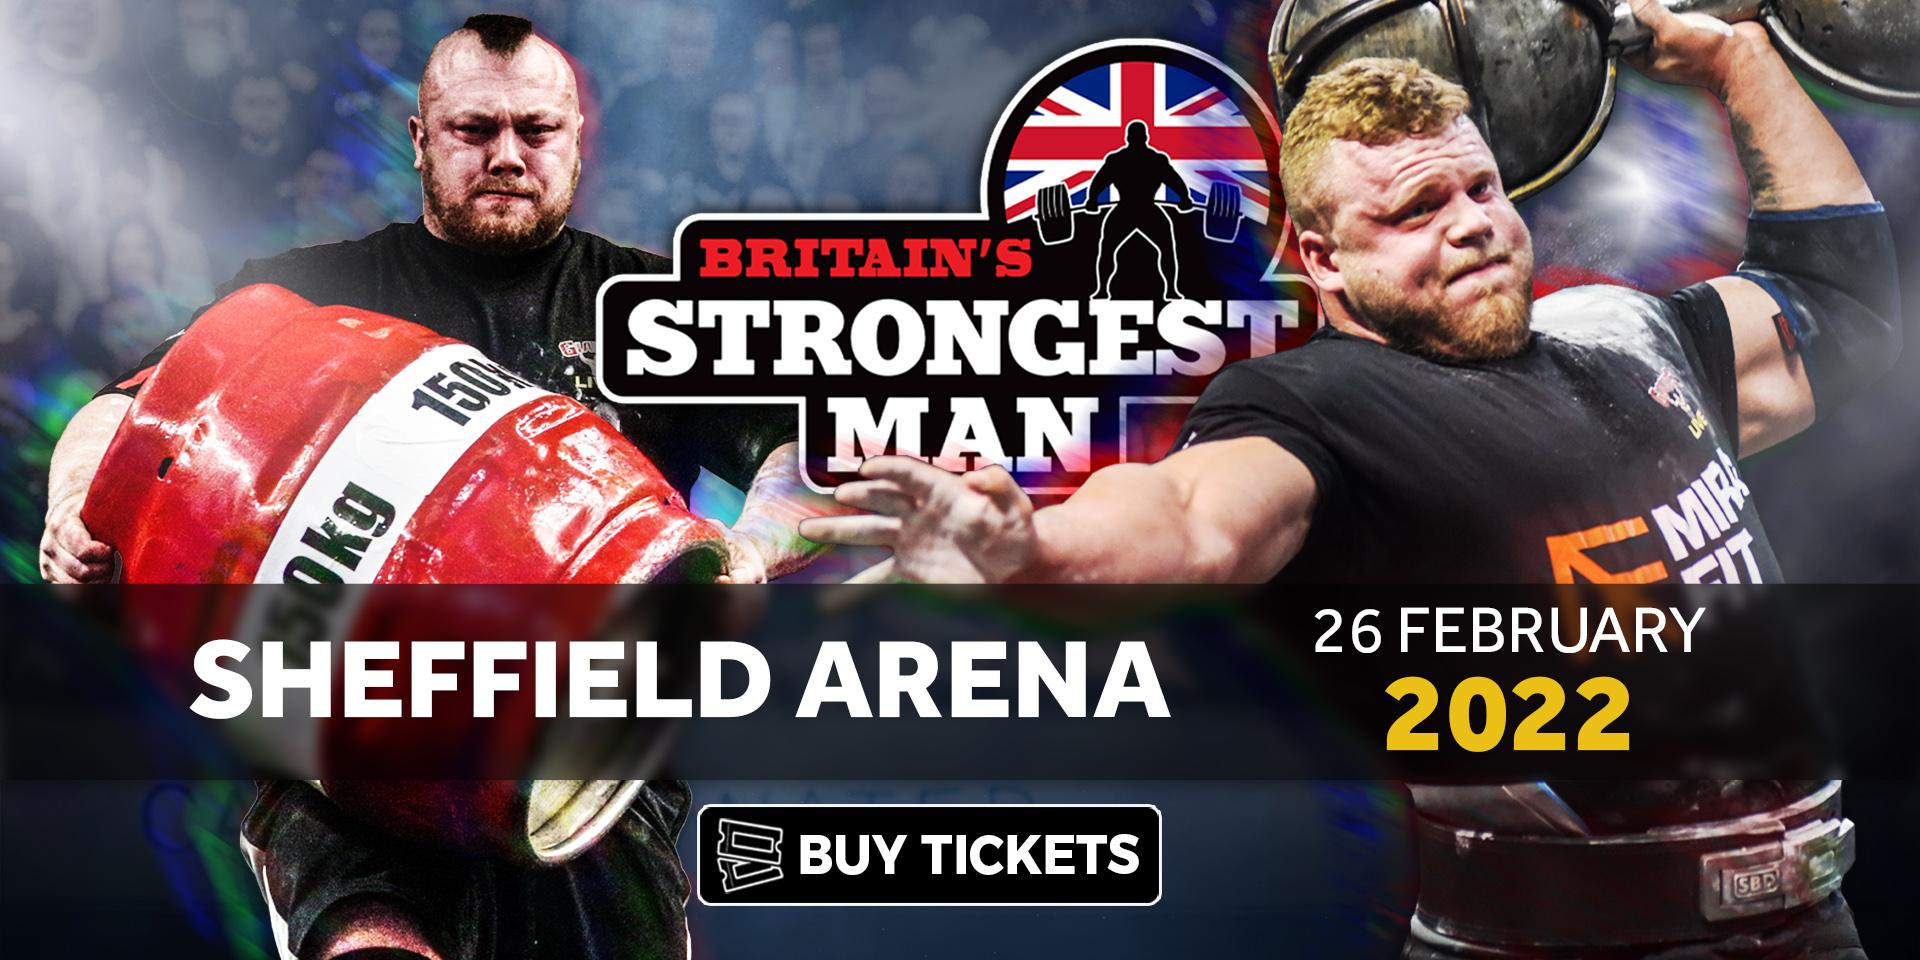 Britain's Strongest Man 2022